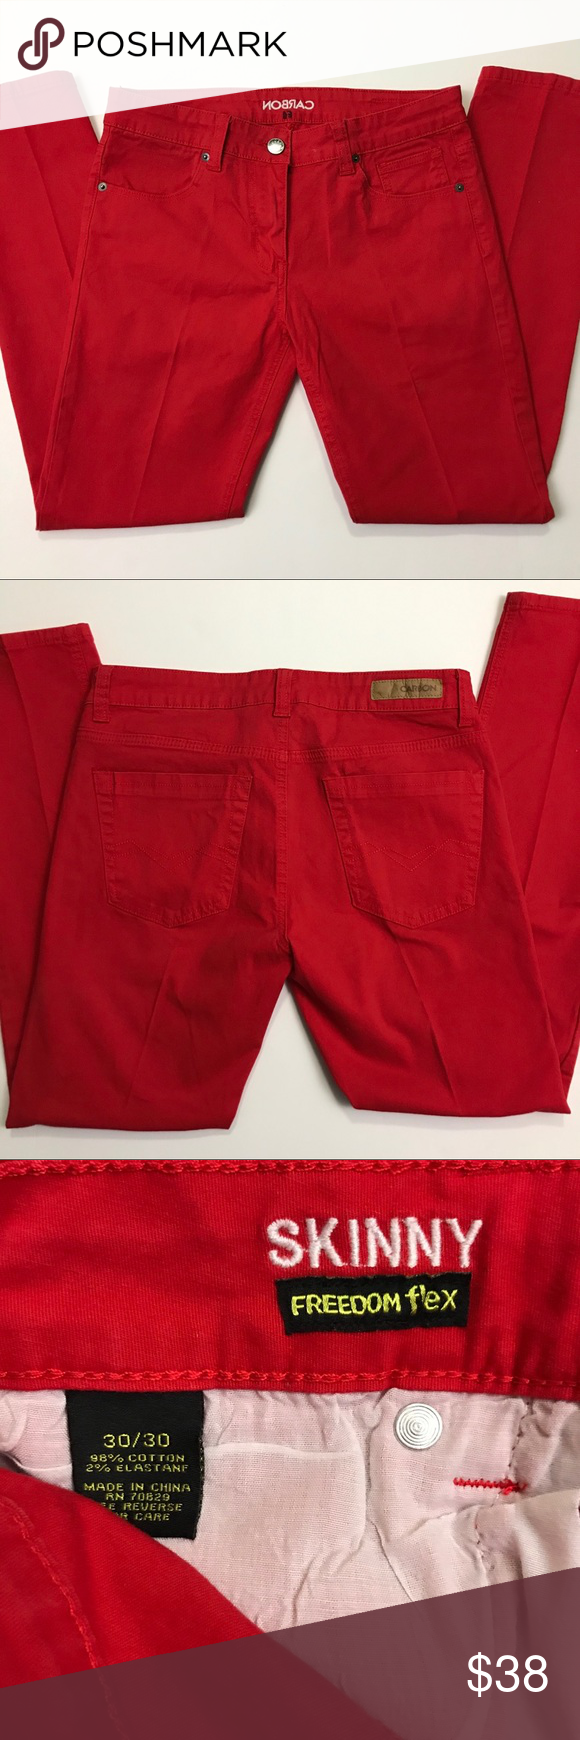 Carbon Skinny Freedom Flex Men S Pants 30 30 Red Skinny Khaki Chinos Pants